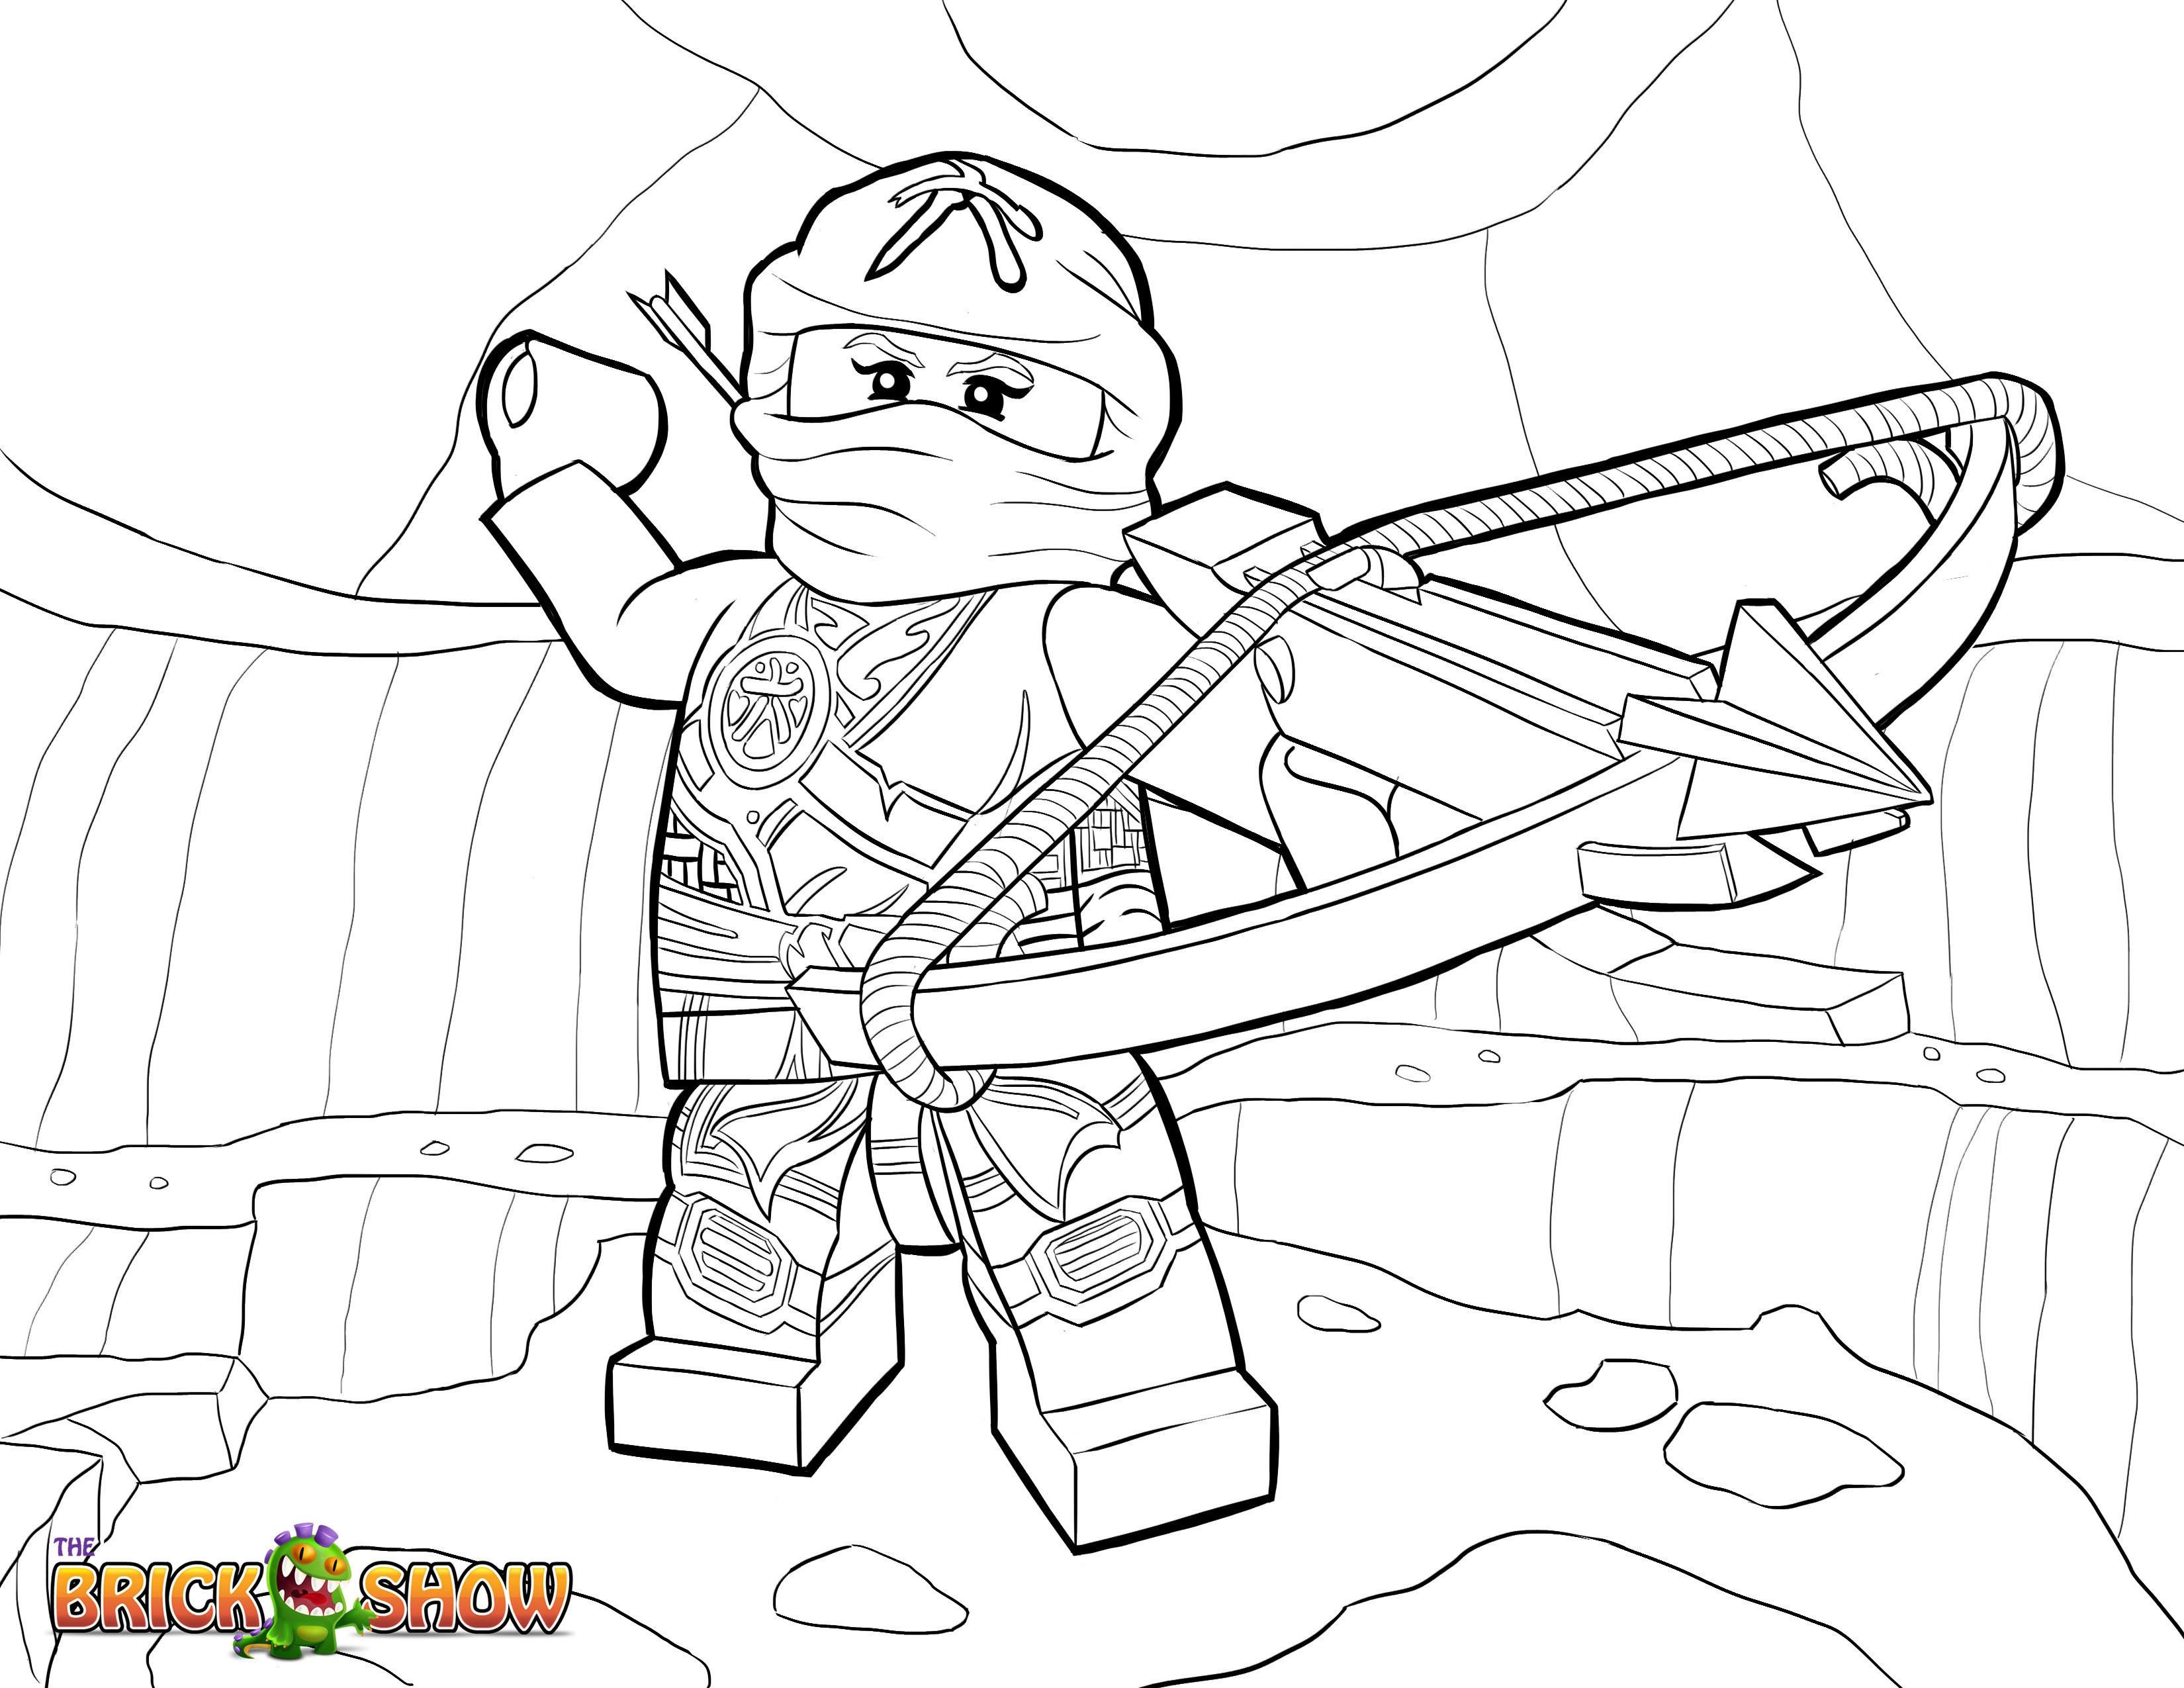 Ausmalbilder Kostenlos Ninjago Einzigartig top 75 Free Printable Pokemon Coloring Pages Line Best Lego Bilder